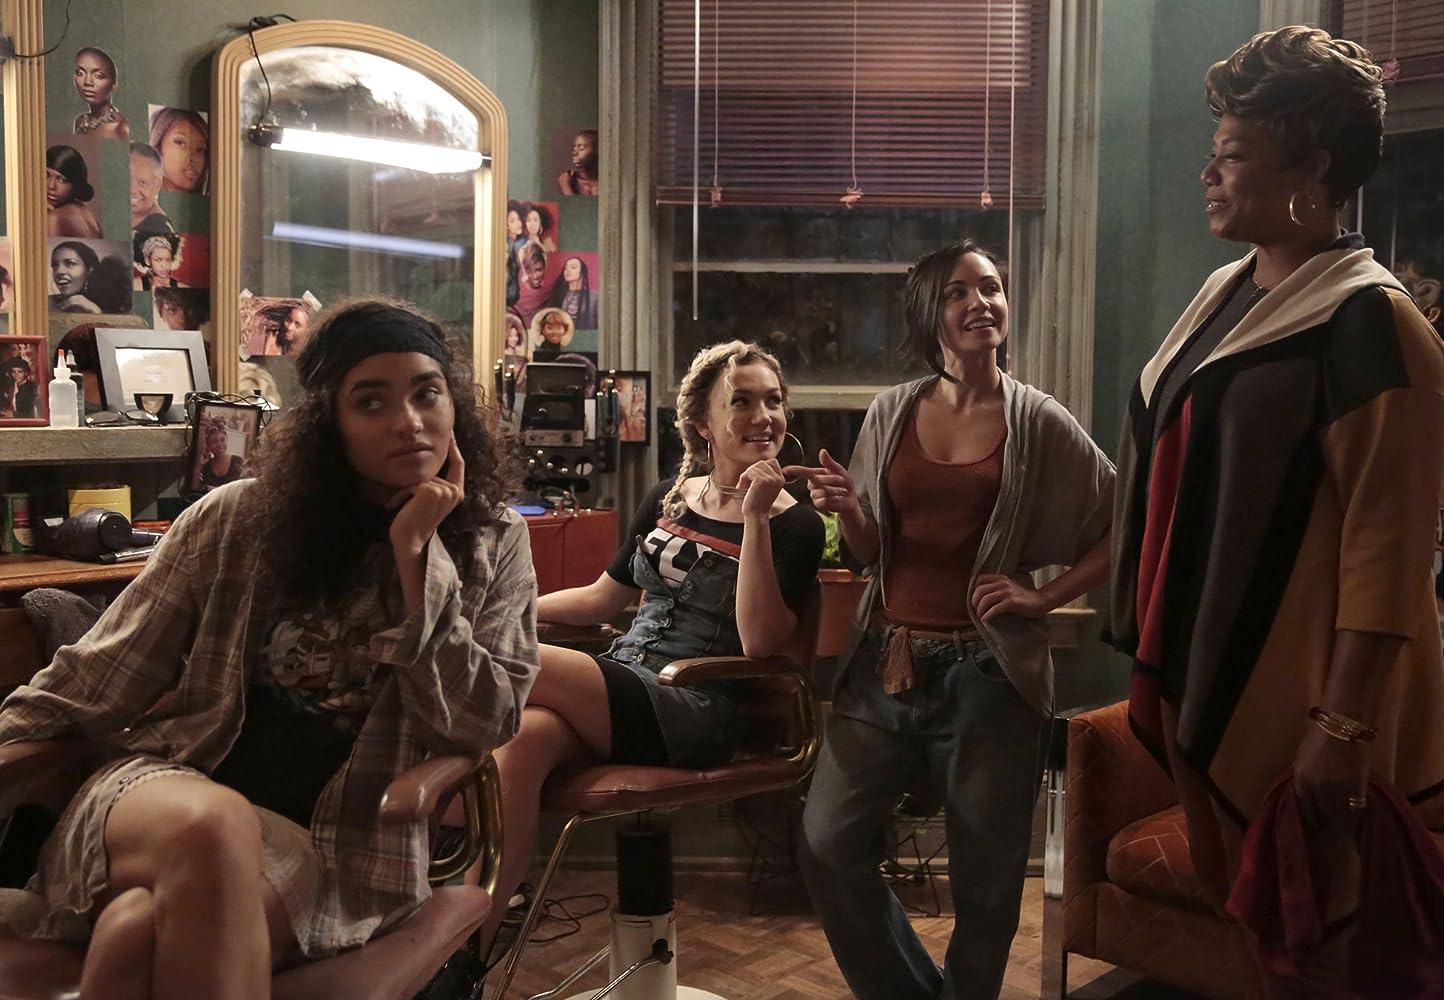 Queen Latifah, Sharlene Taulé, Jude Demorest, and Brittany O'Grady in Star (2016)